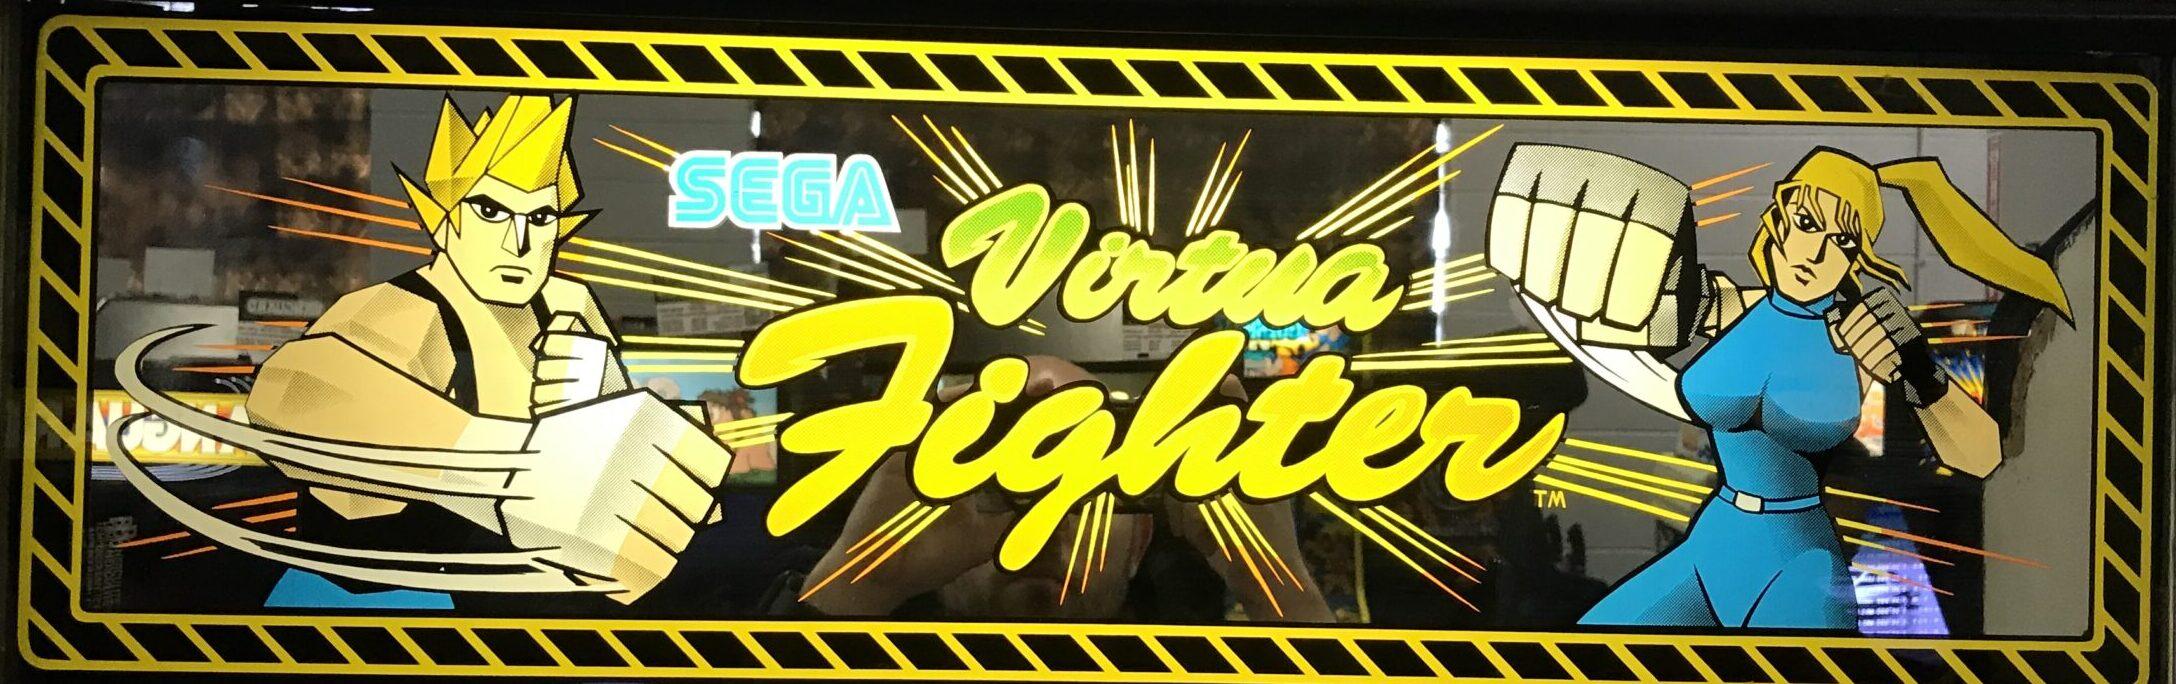 A World of Games: Virtua Fighter